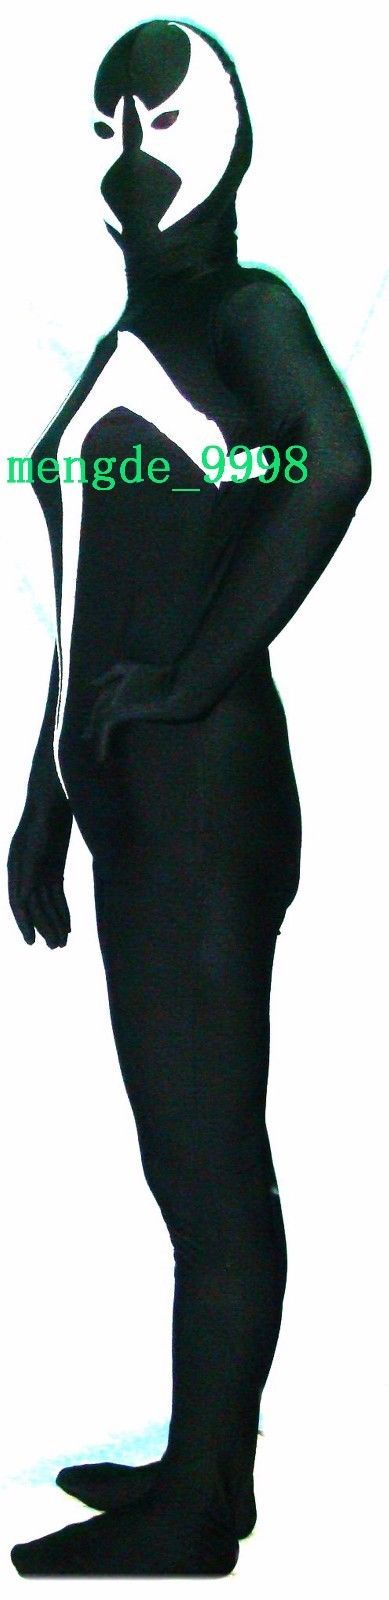 Spawn Costume